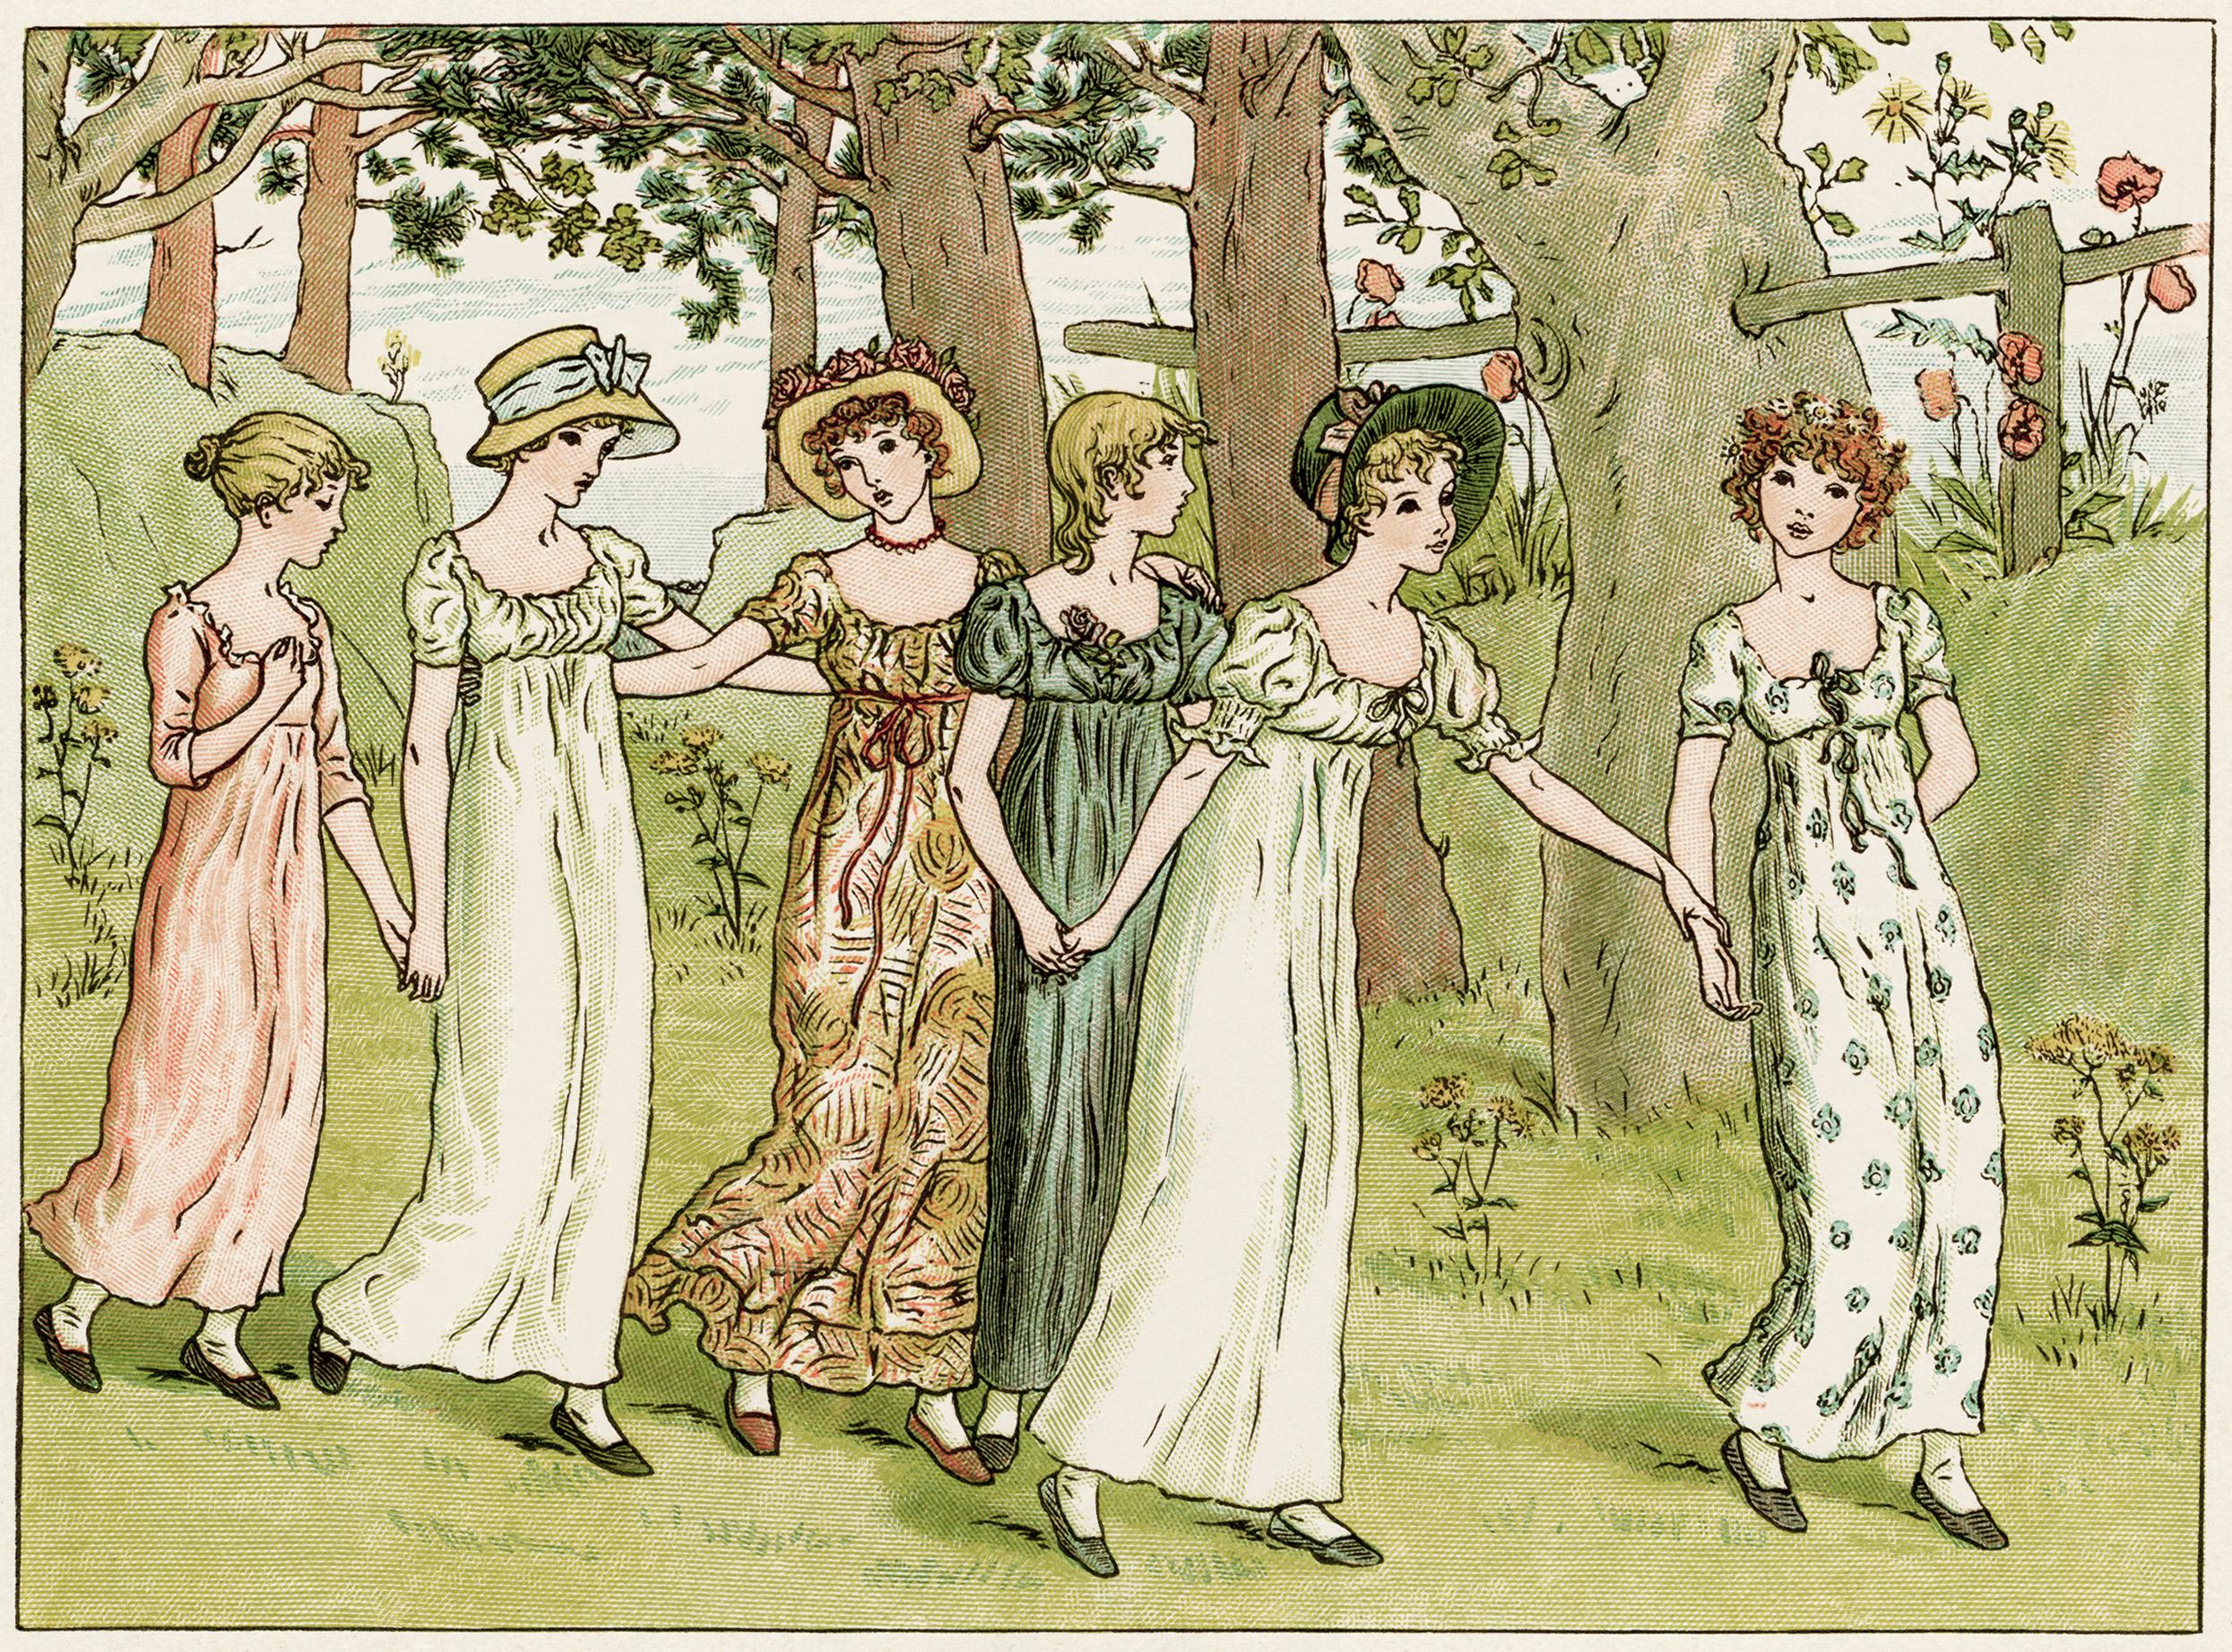 Victorian girls illustration, Kate Greenaway, vintage storybook image, girls walking clipart, childrens story printable